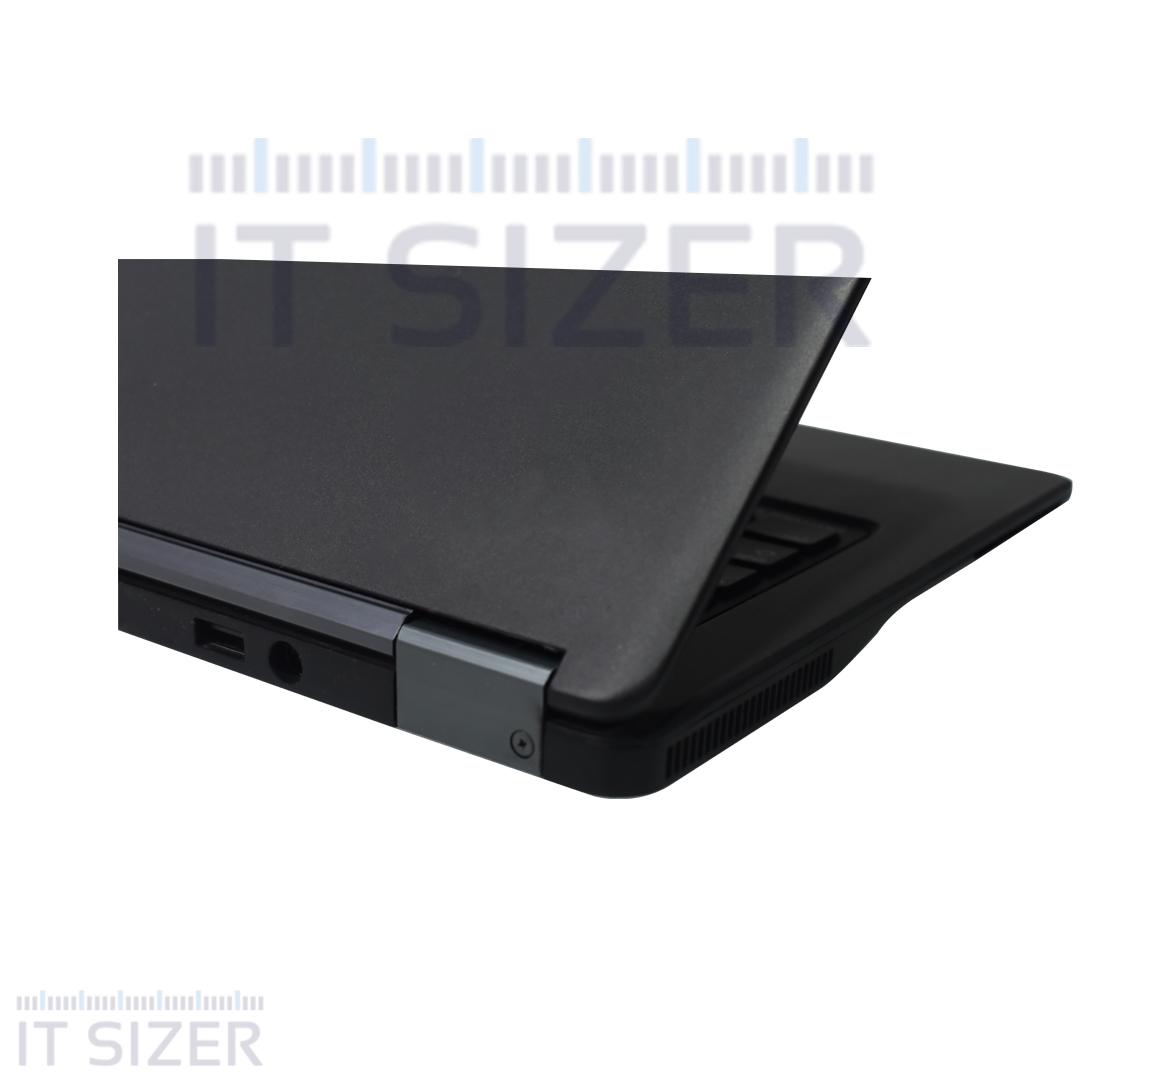 Dell Latitude E7250 Business Laptop, Intel Core i5-5300U CPU, 8GB DDR3L SODIMM RAM, 256GB MSATA 1, 12 inch Display, Windows 10 Pro (Renewed)